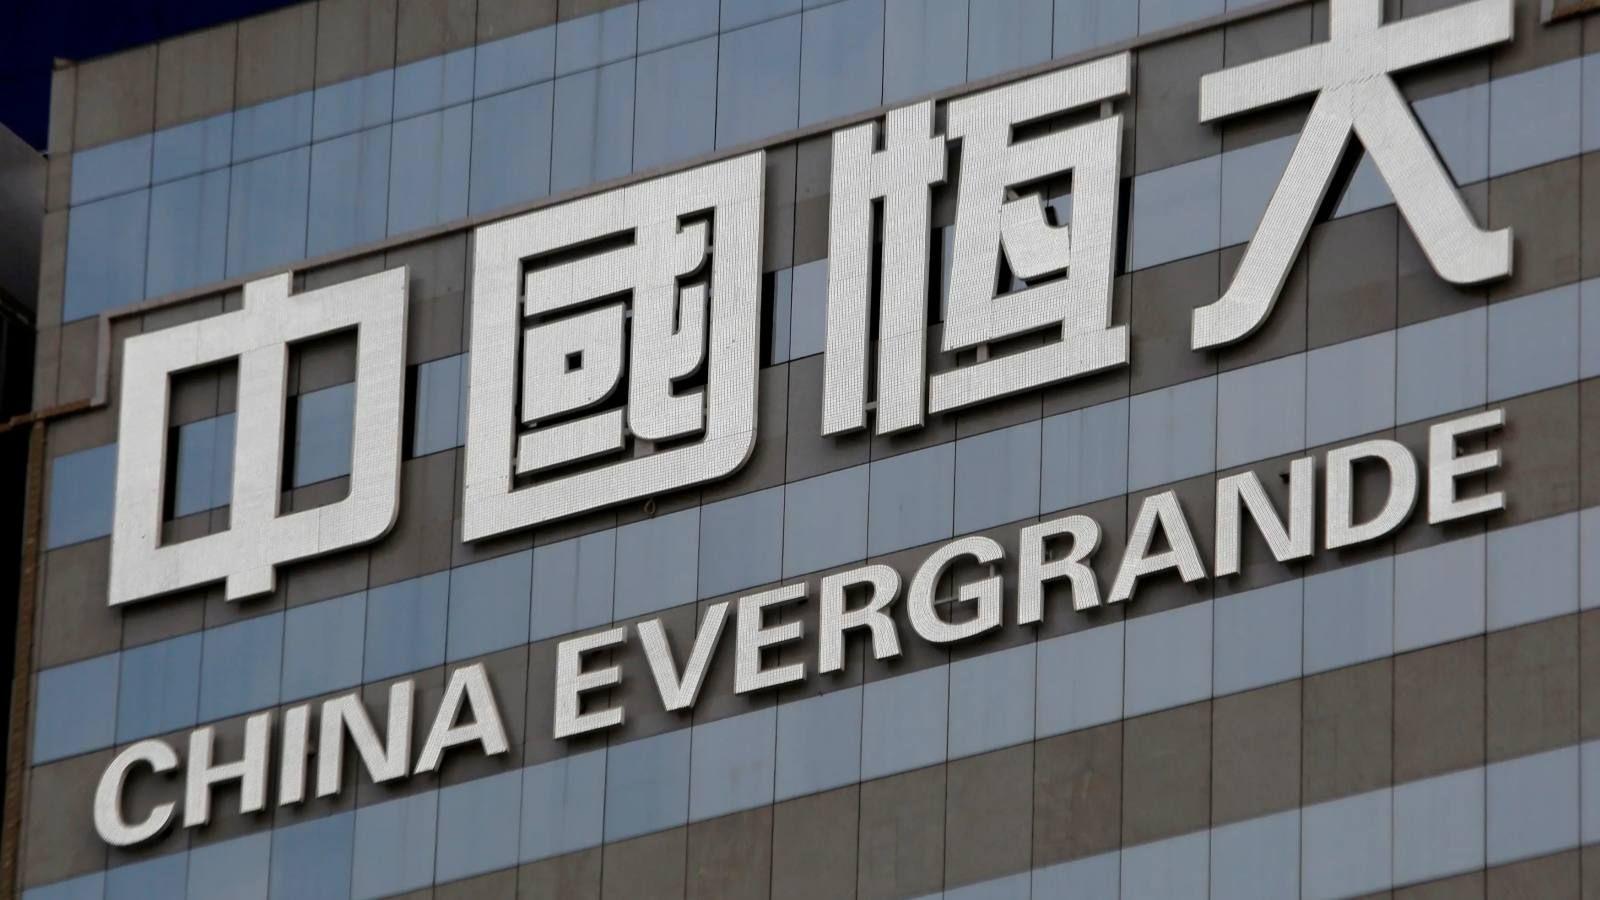 China Evergrande продала долю в Guanghui Industrial за $2,2 млрд- Kapital.kz